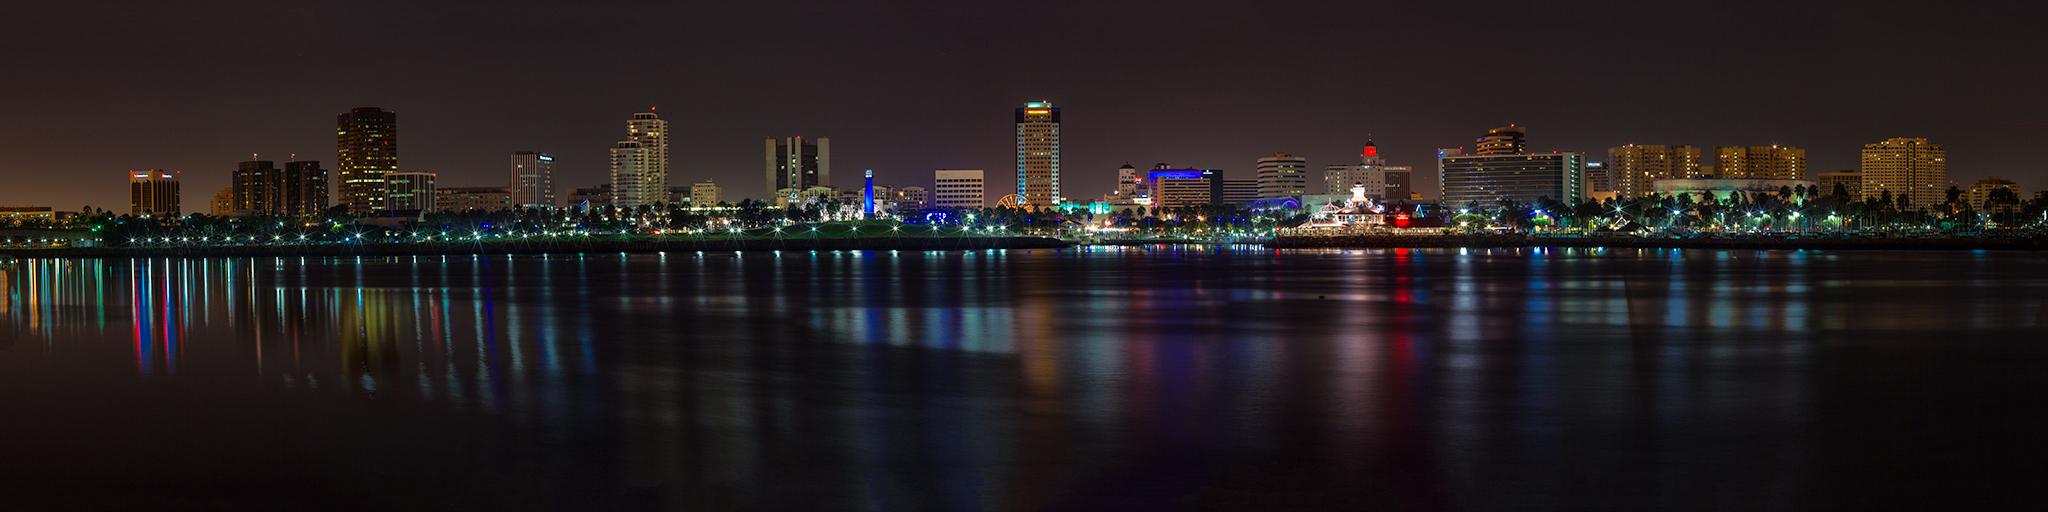 Long Beach 2014 Panorama1.jpg